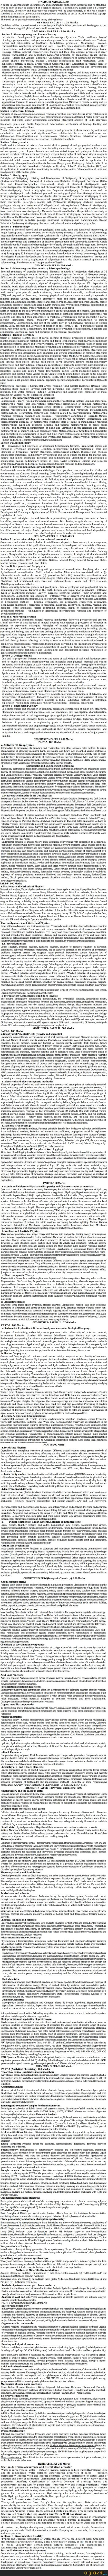 UPSC Geoscientist & Geologist Syllabus PDF   Download Here